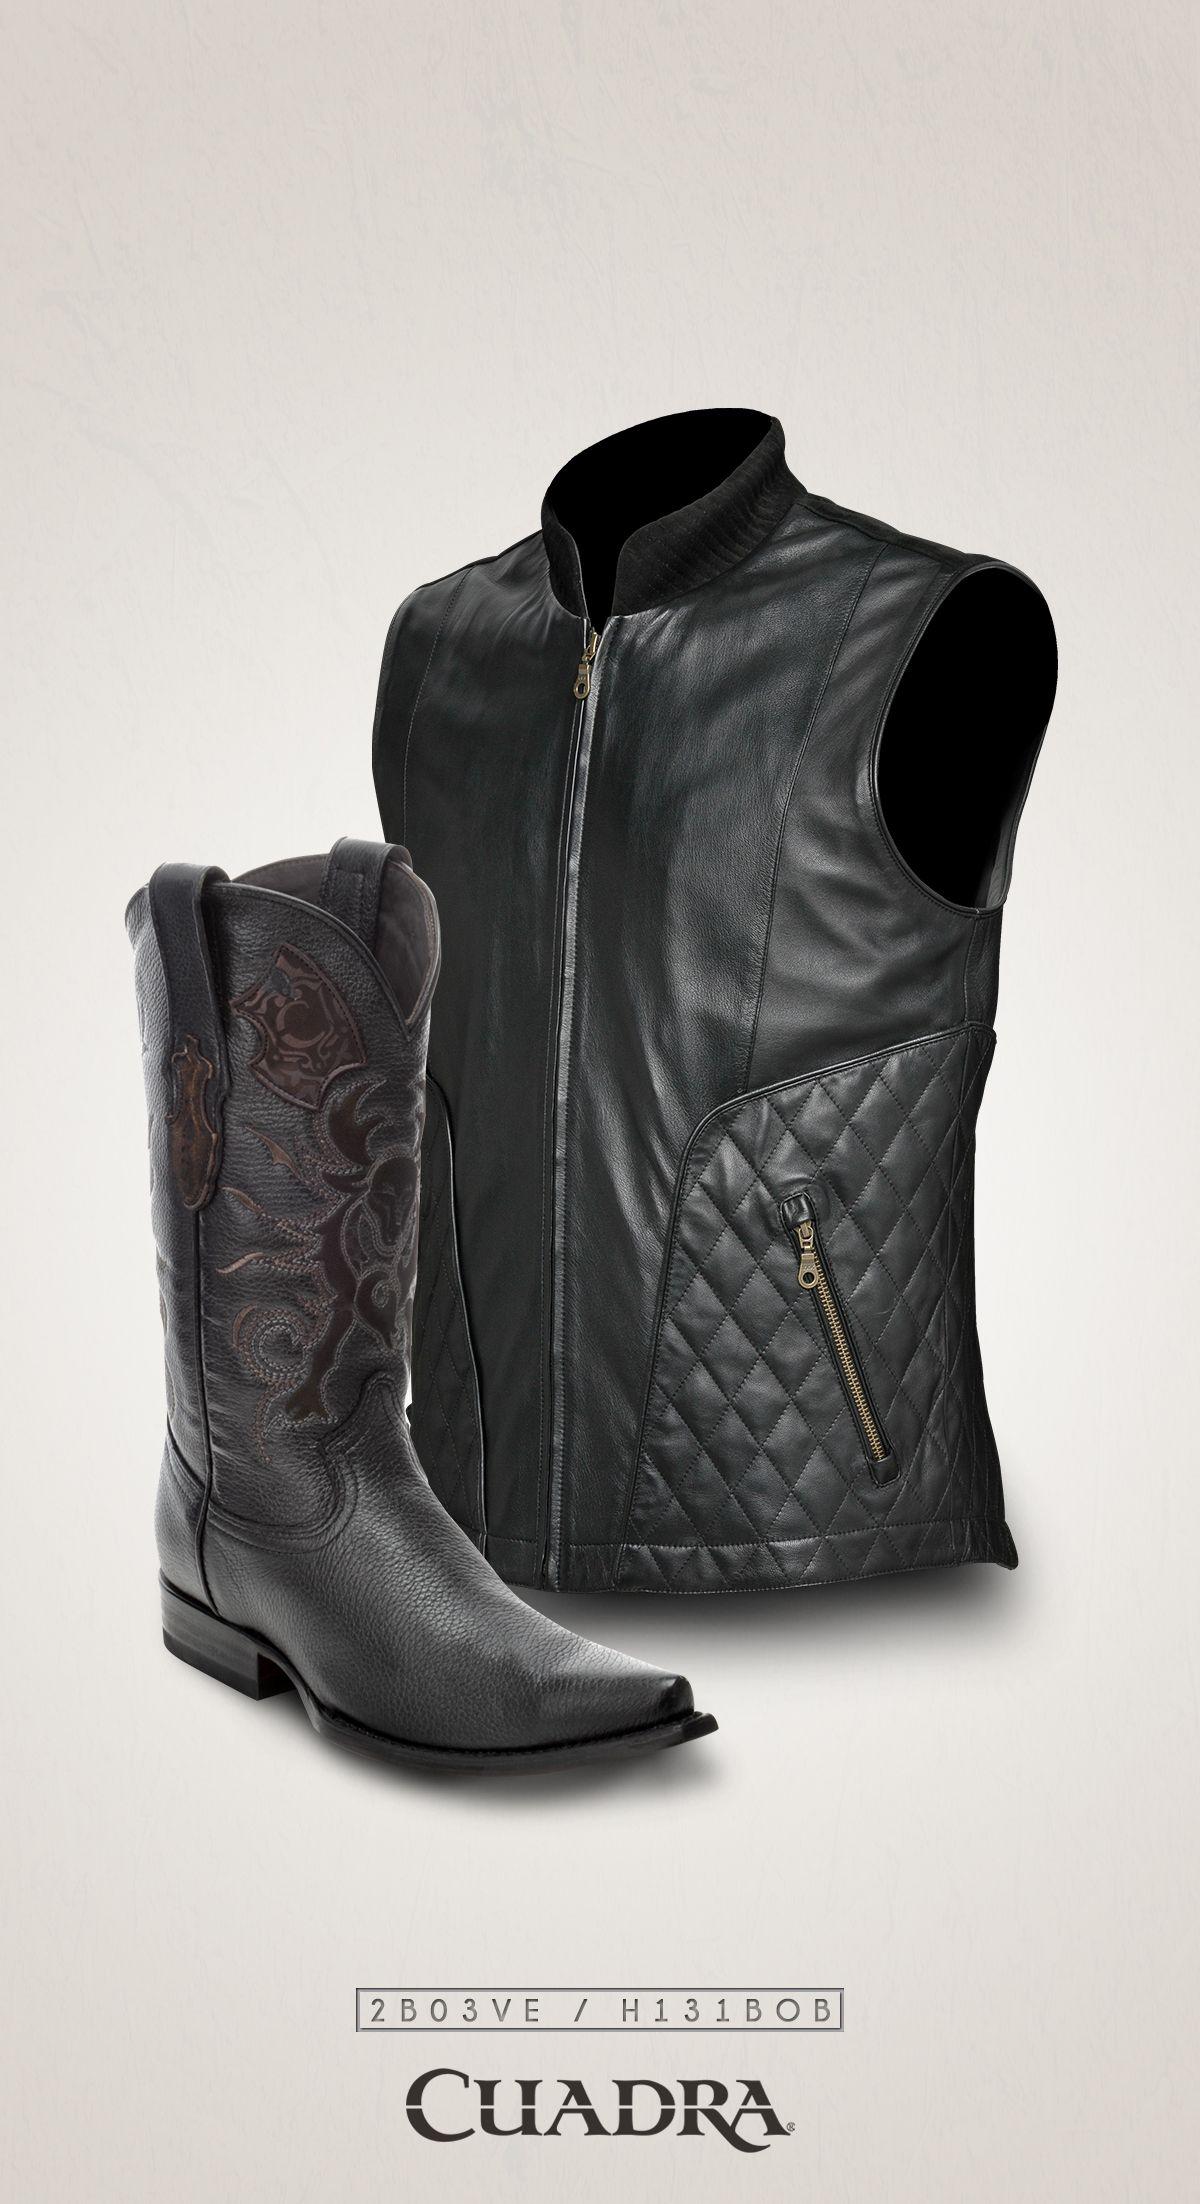 2f3a88ec4e Yo soy un hombre Cuadra.  moda  boots  menfashion  menswear ...